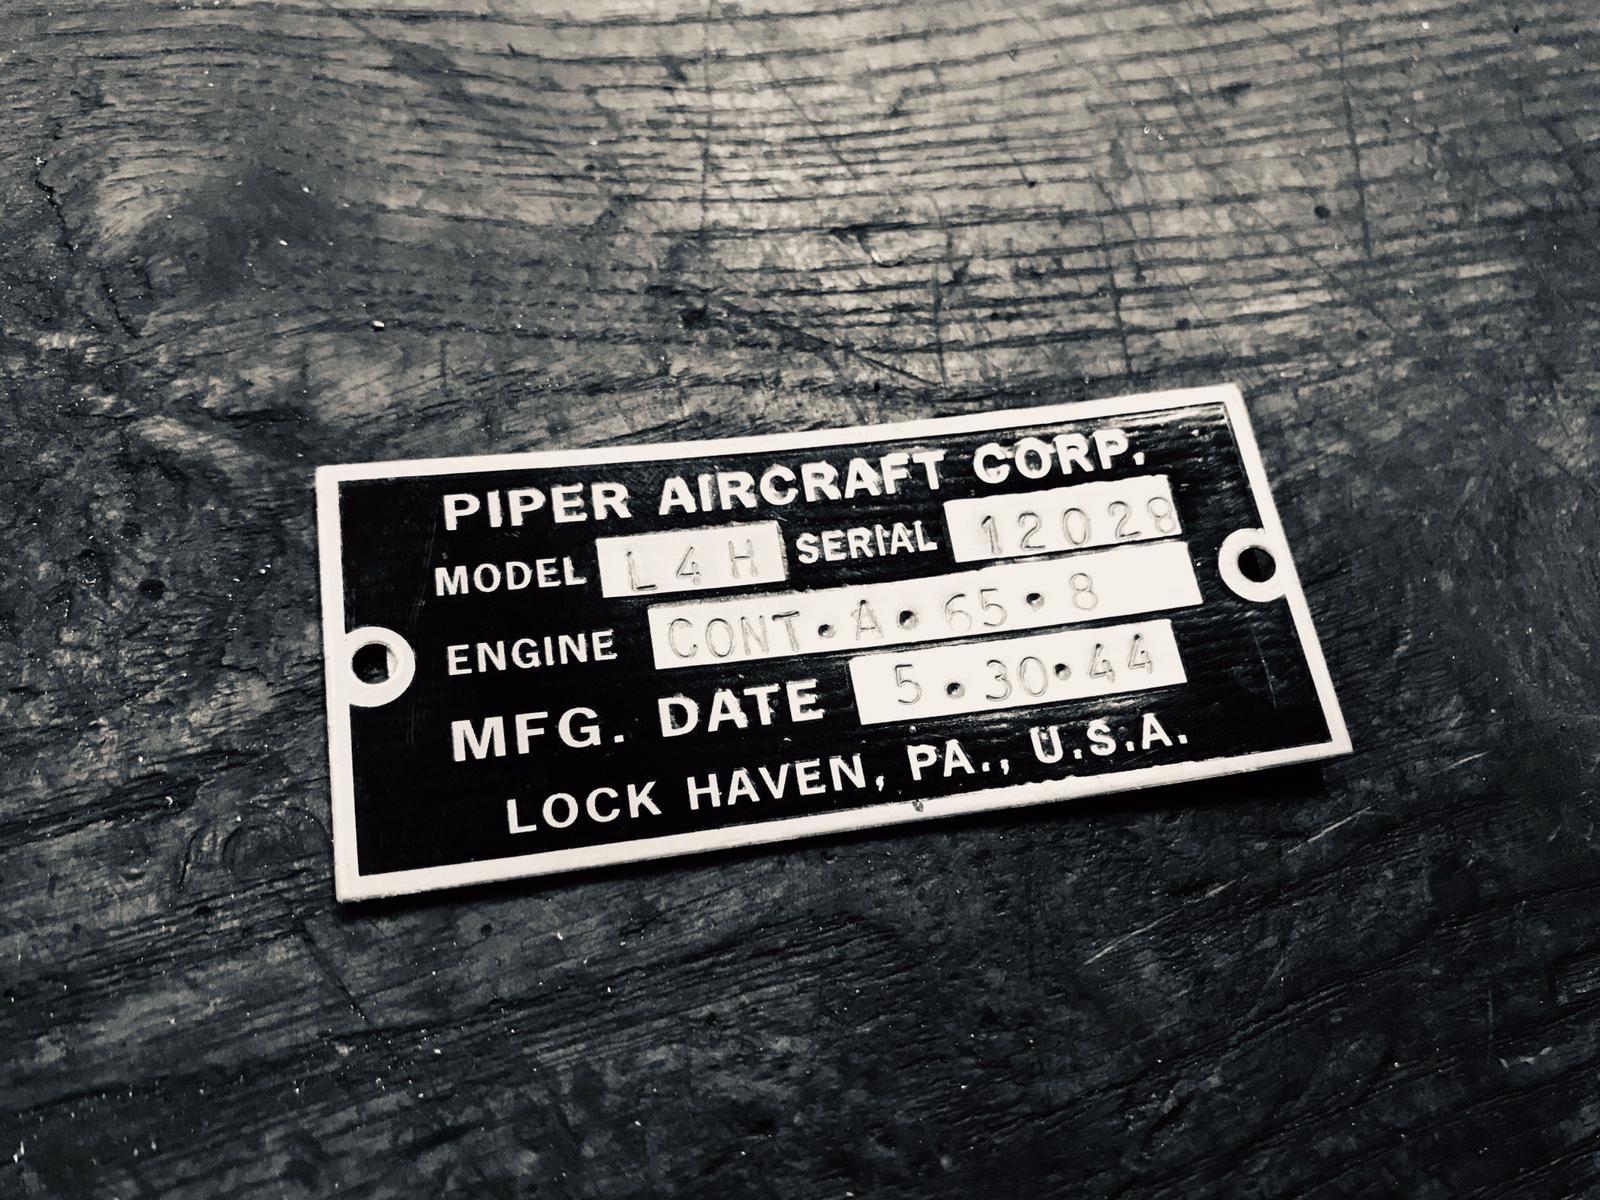 HISTORICAL PIPER CUB L-4H BUILT IN 1944